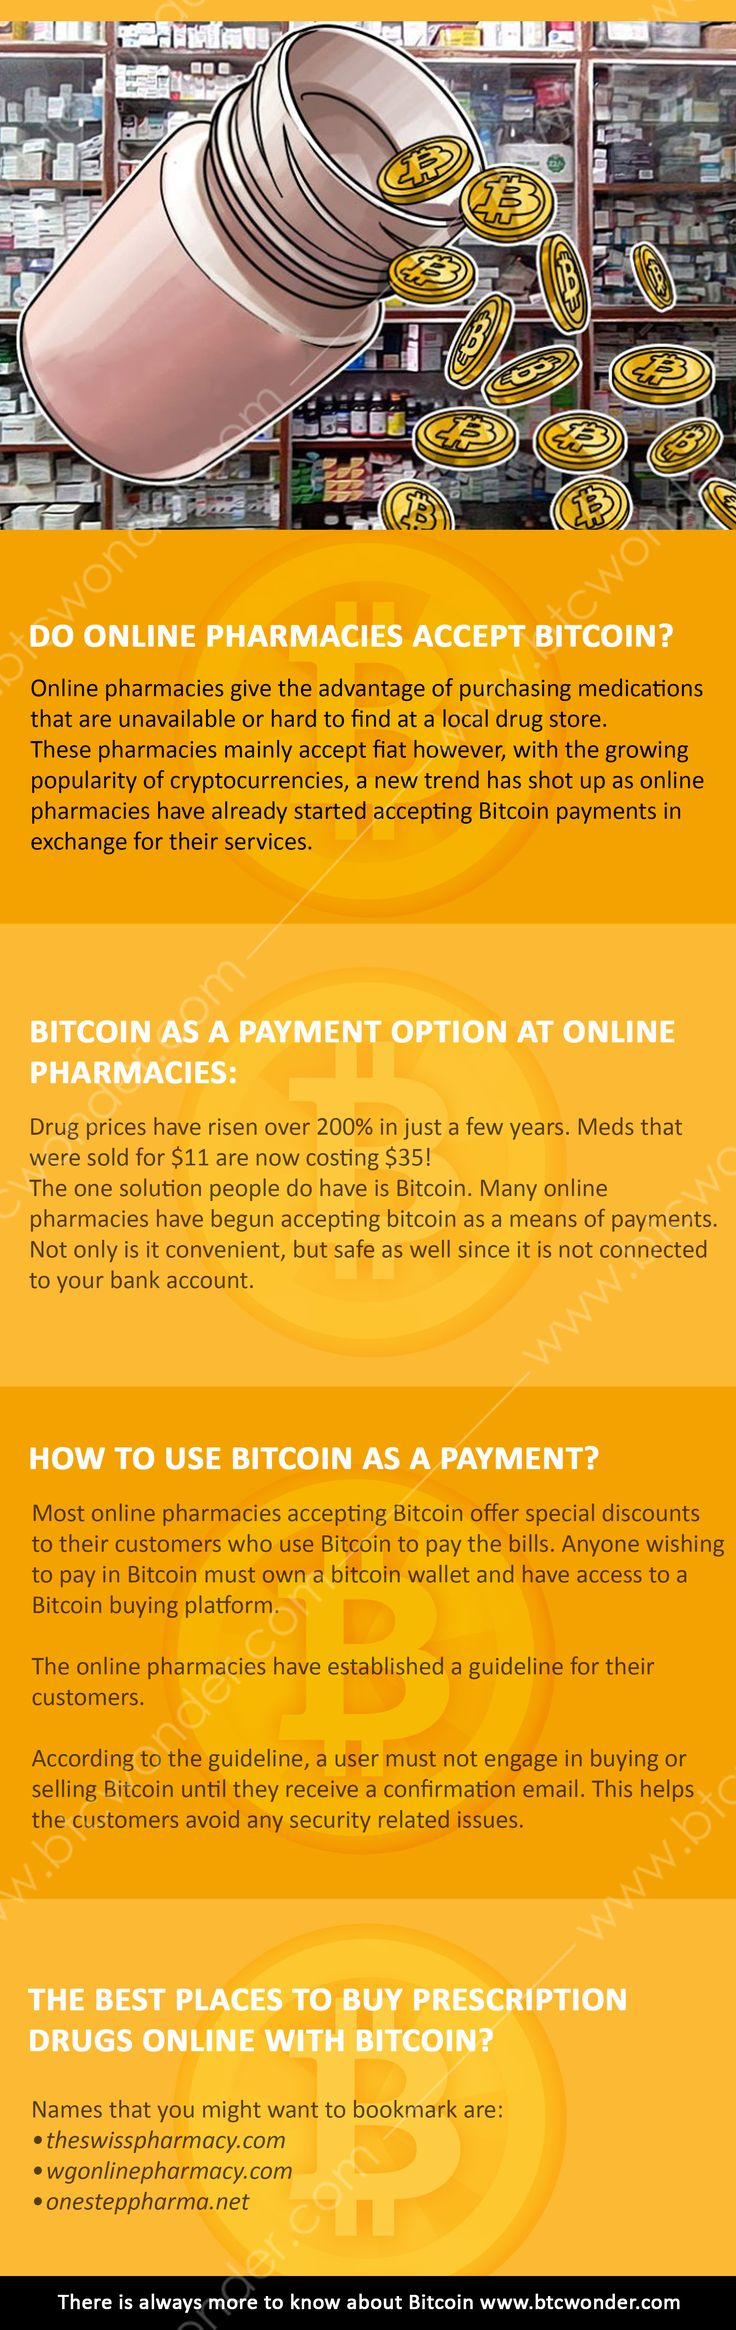 Online Pharmacy Bitcoin – Do Online Pharmacies Accept Bitcoin? - BTC Wonder